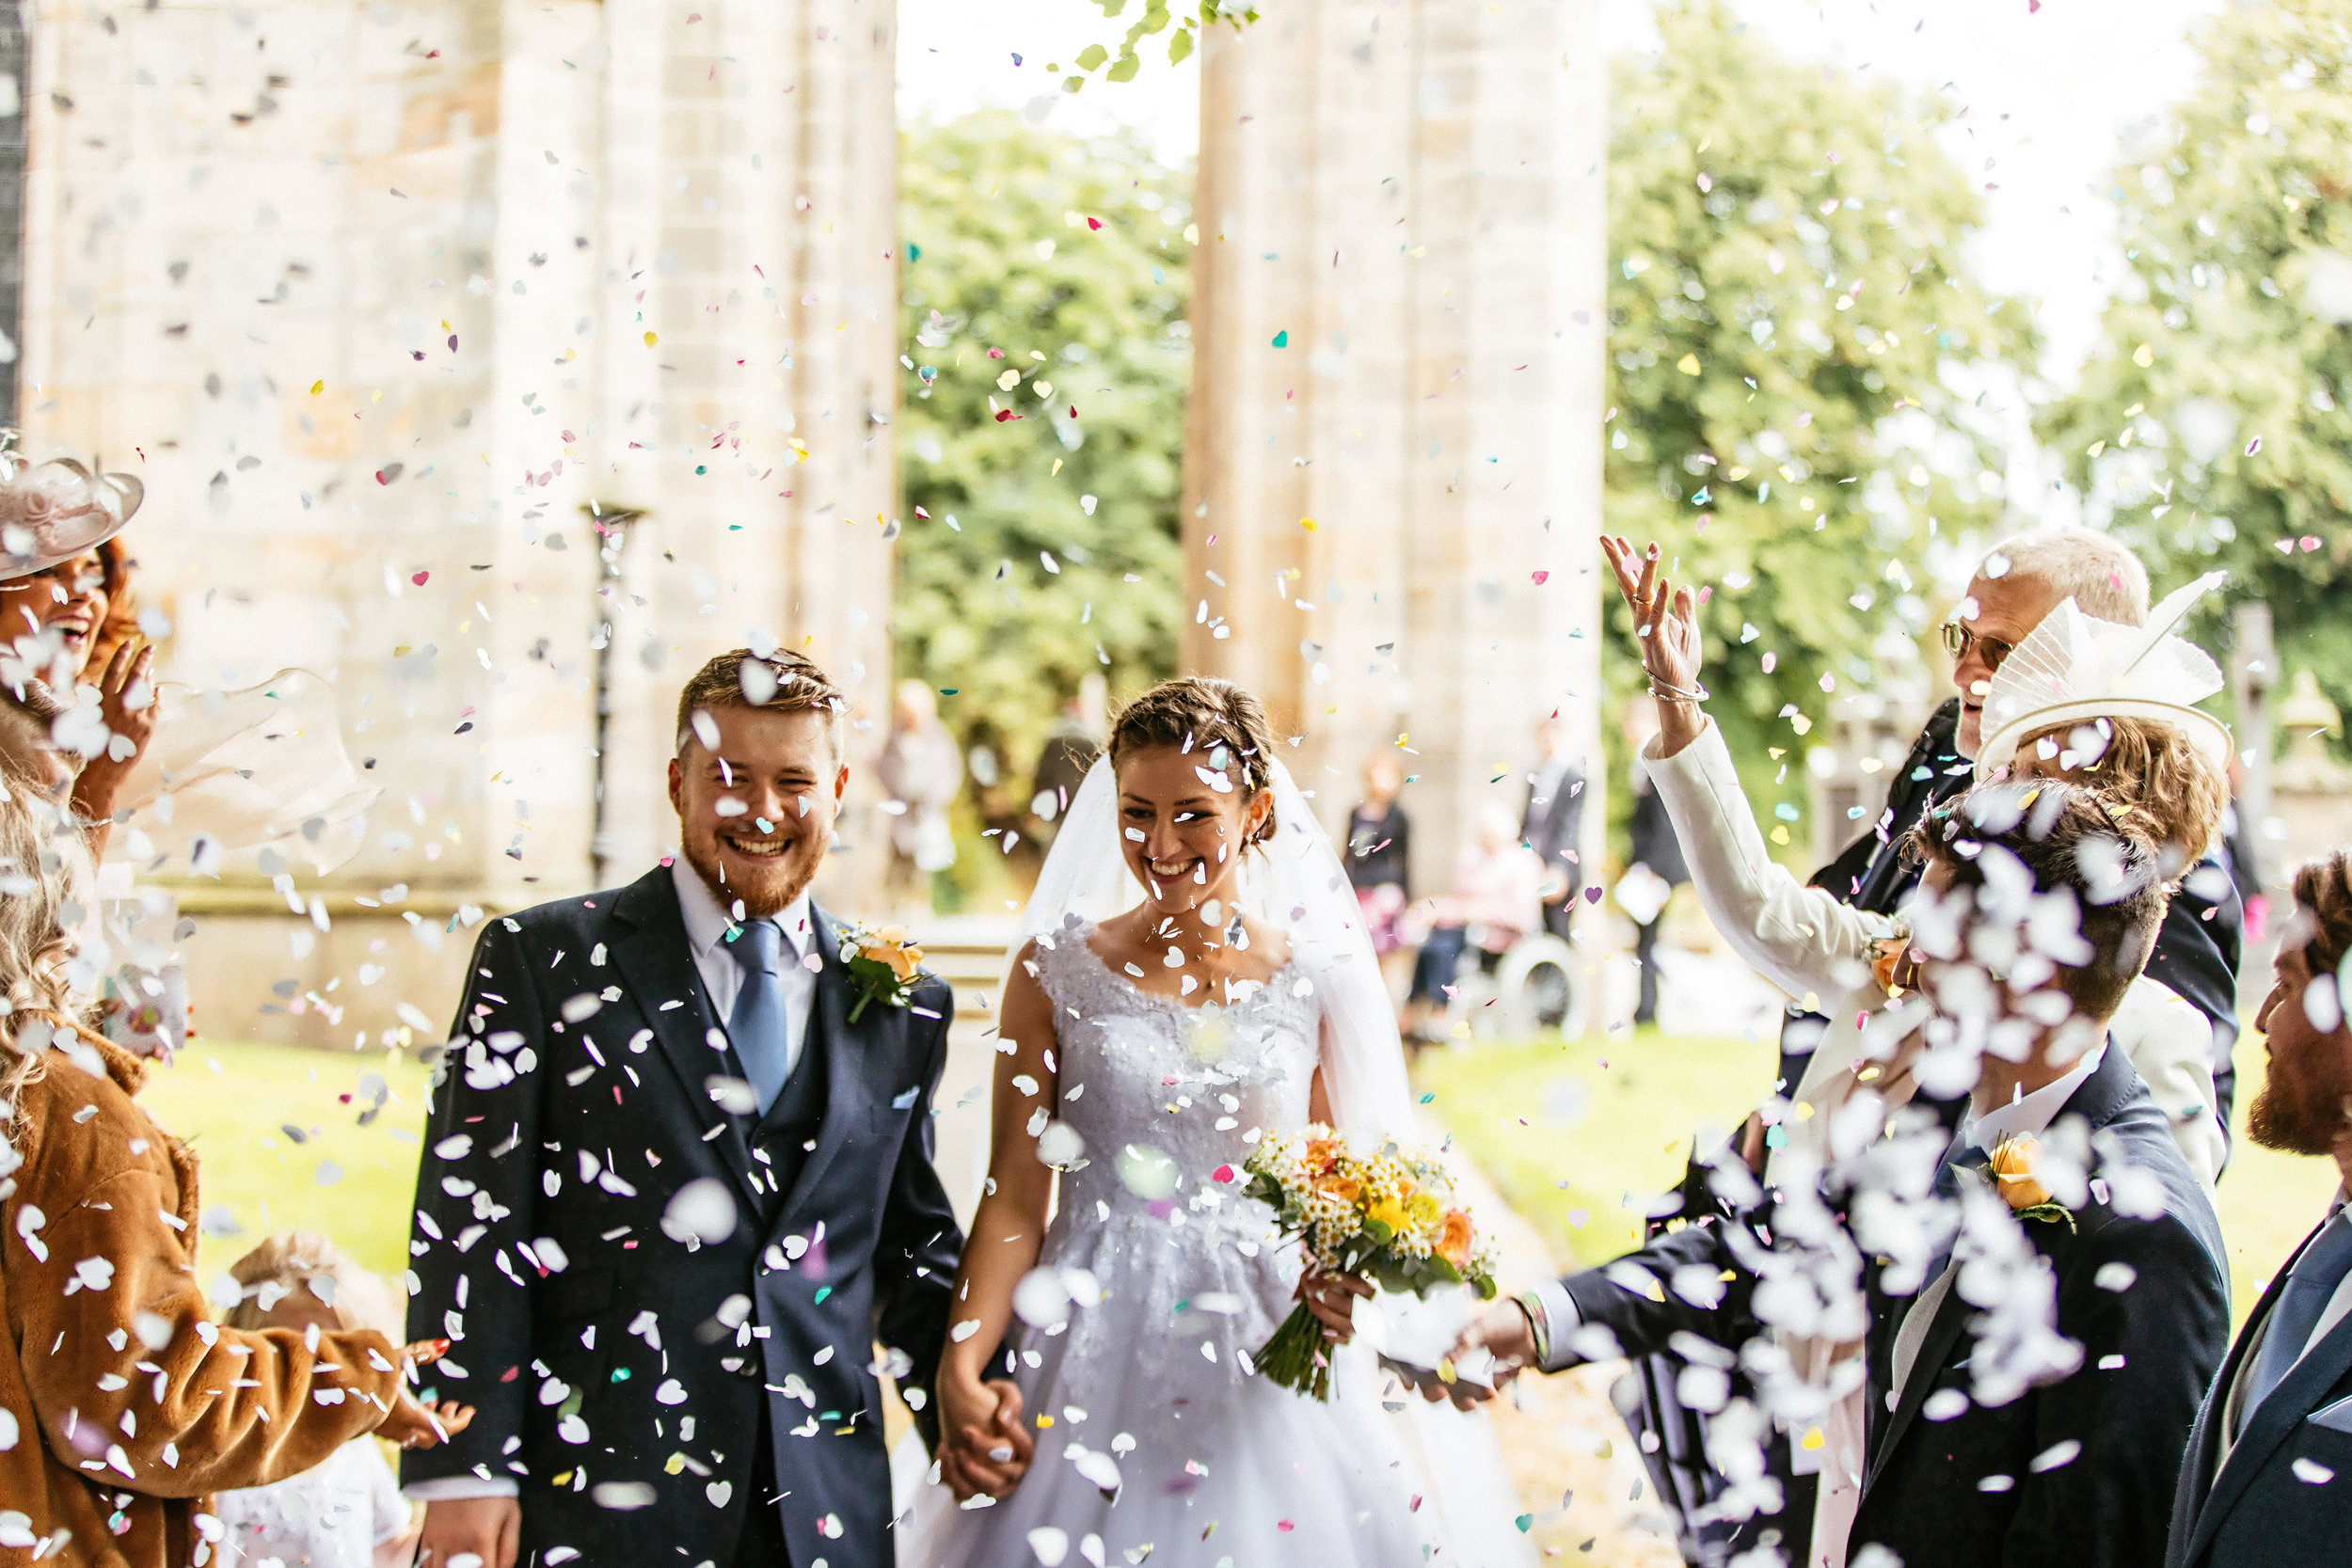 Kathryn-and-Mike-Wedding-Highlights-42.jpg